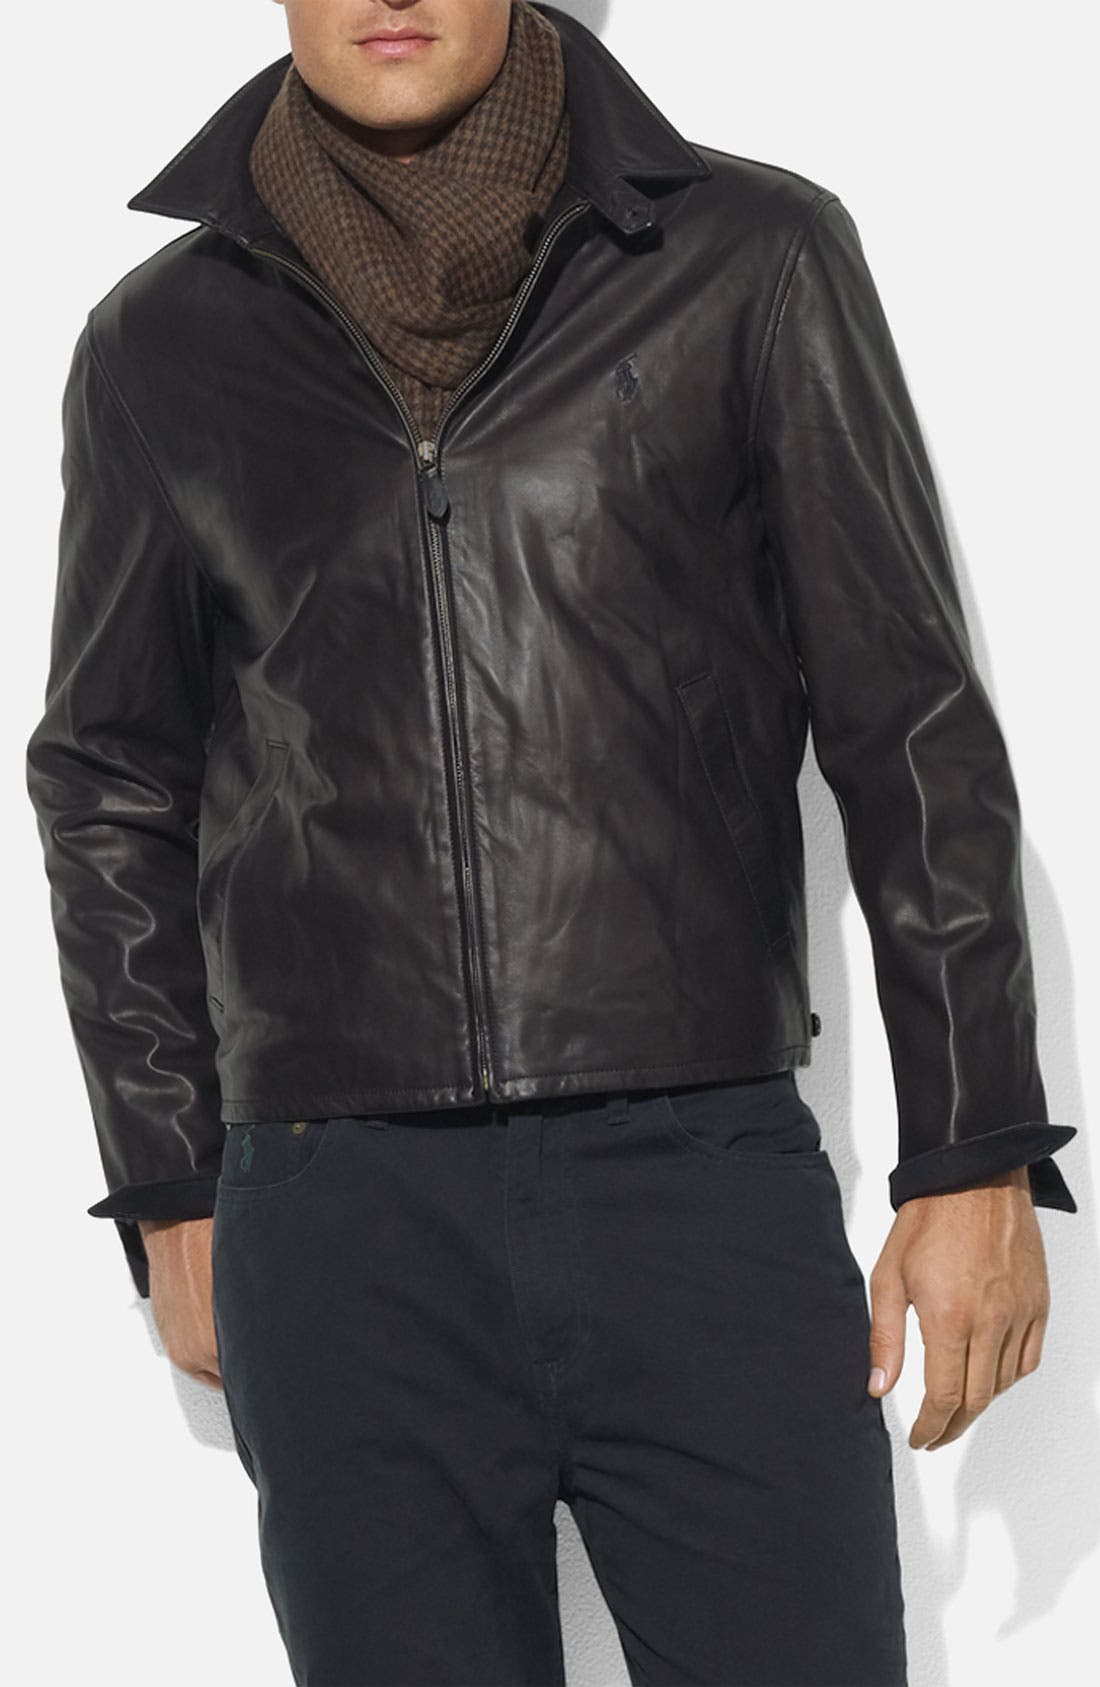 Main Image - Polo Ralph Lauren Leather Jacket